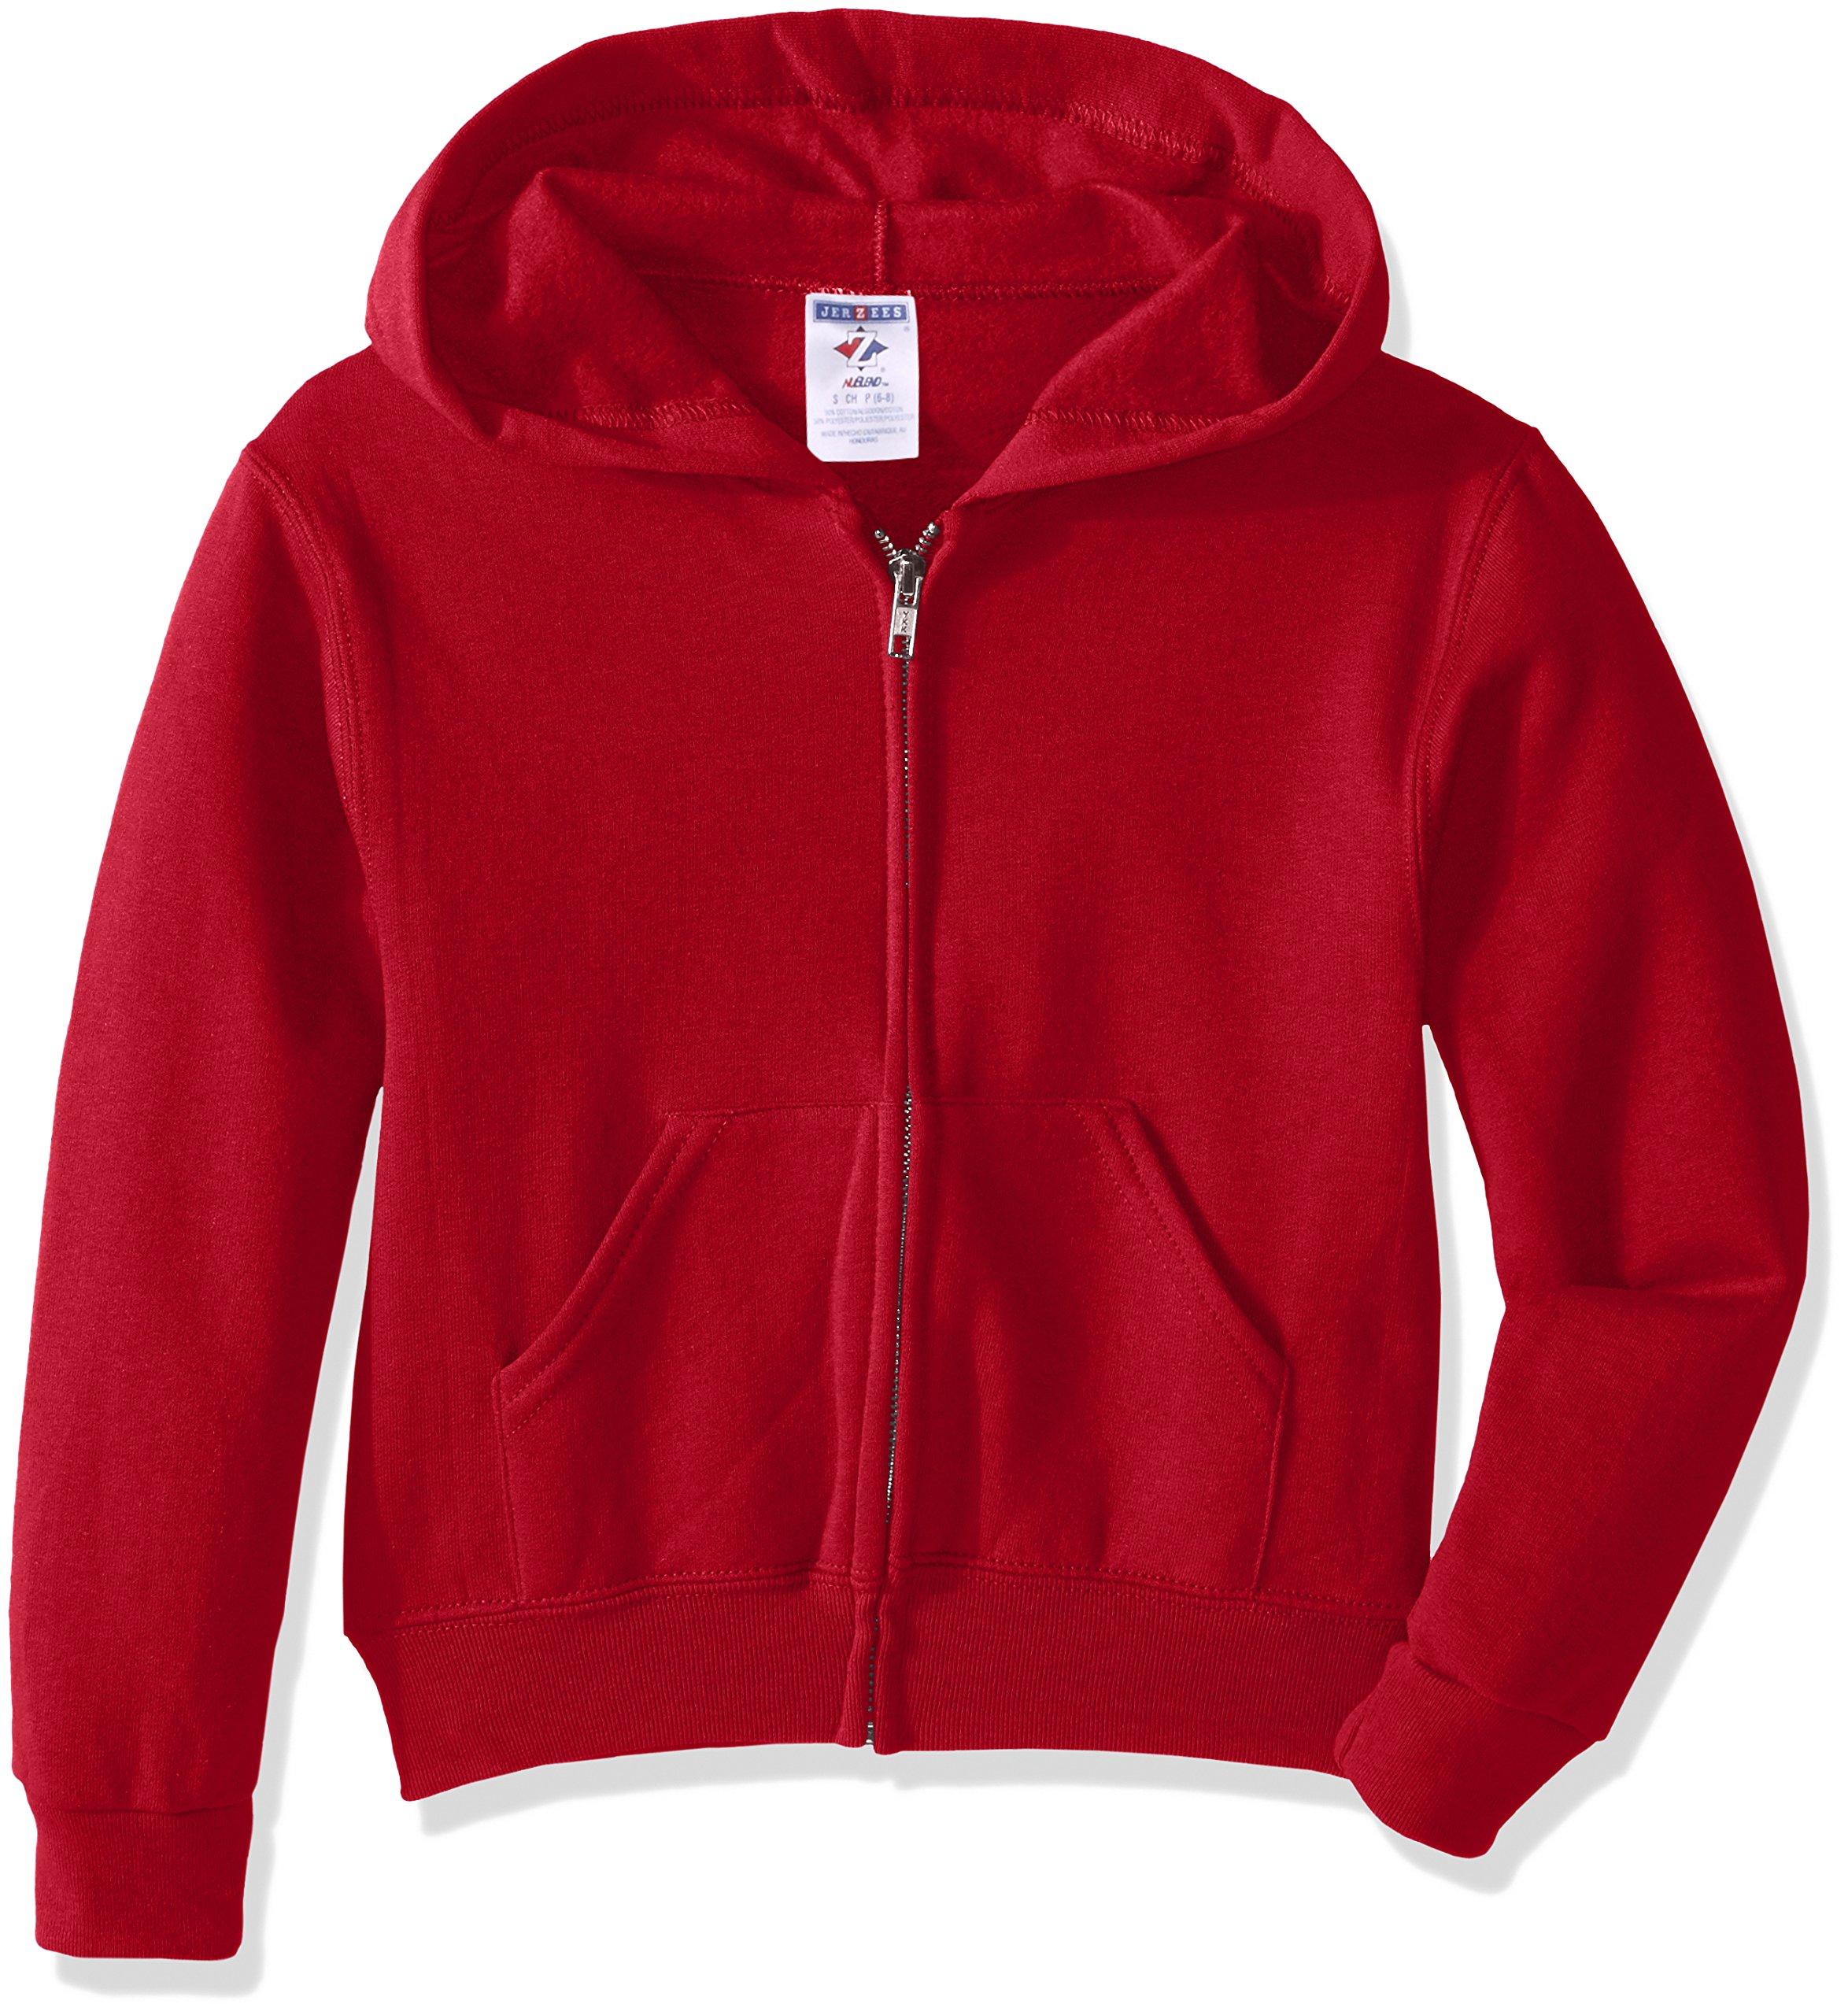 Jerzees Youth Full Zip Hooded Sweatshirt, True Red, Large